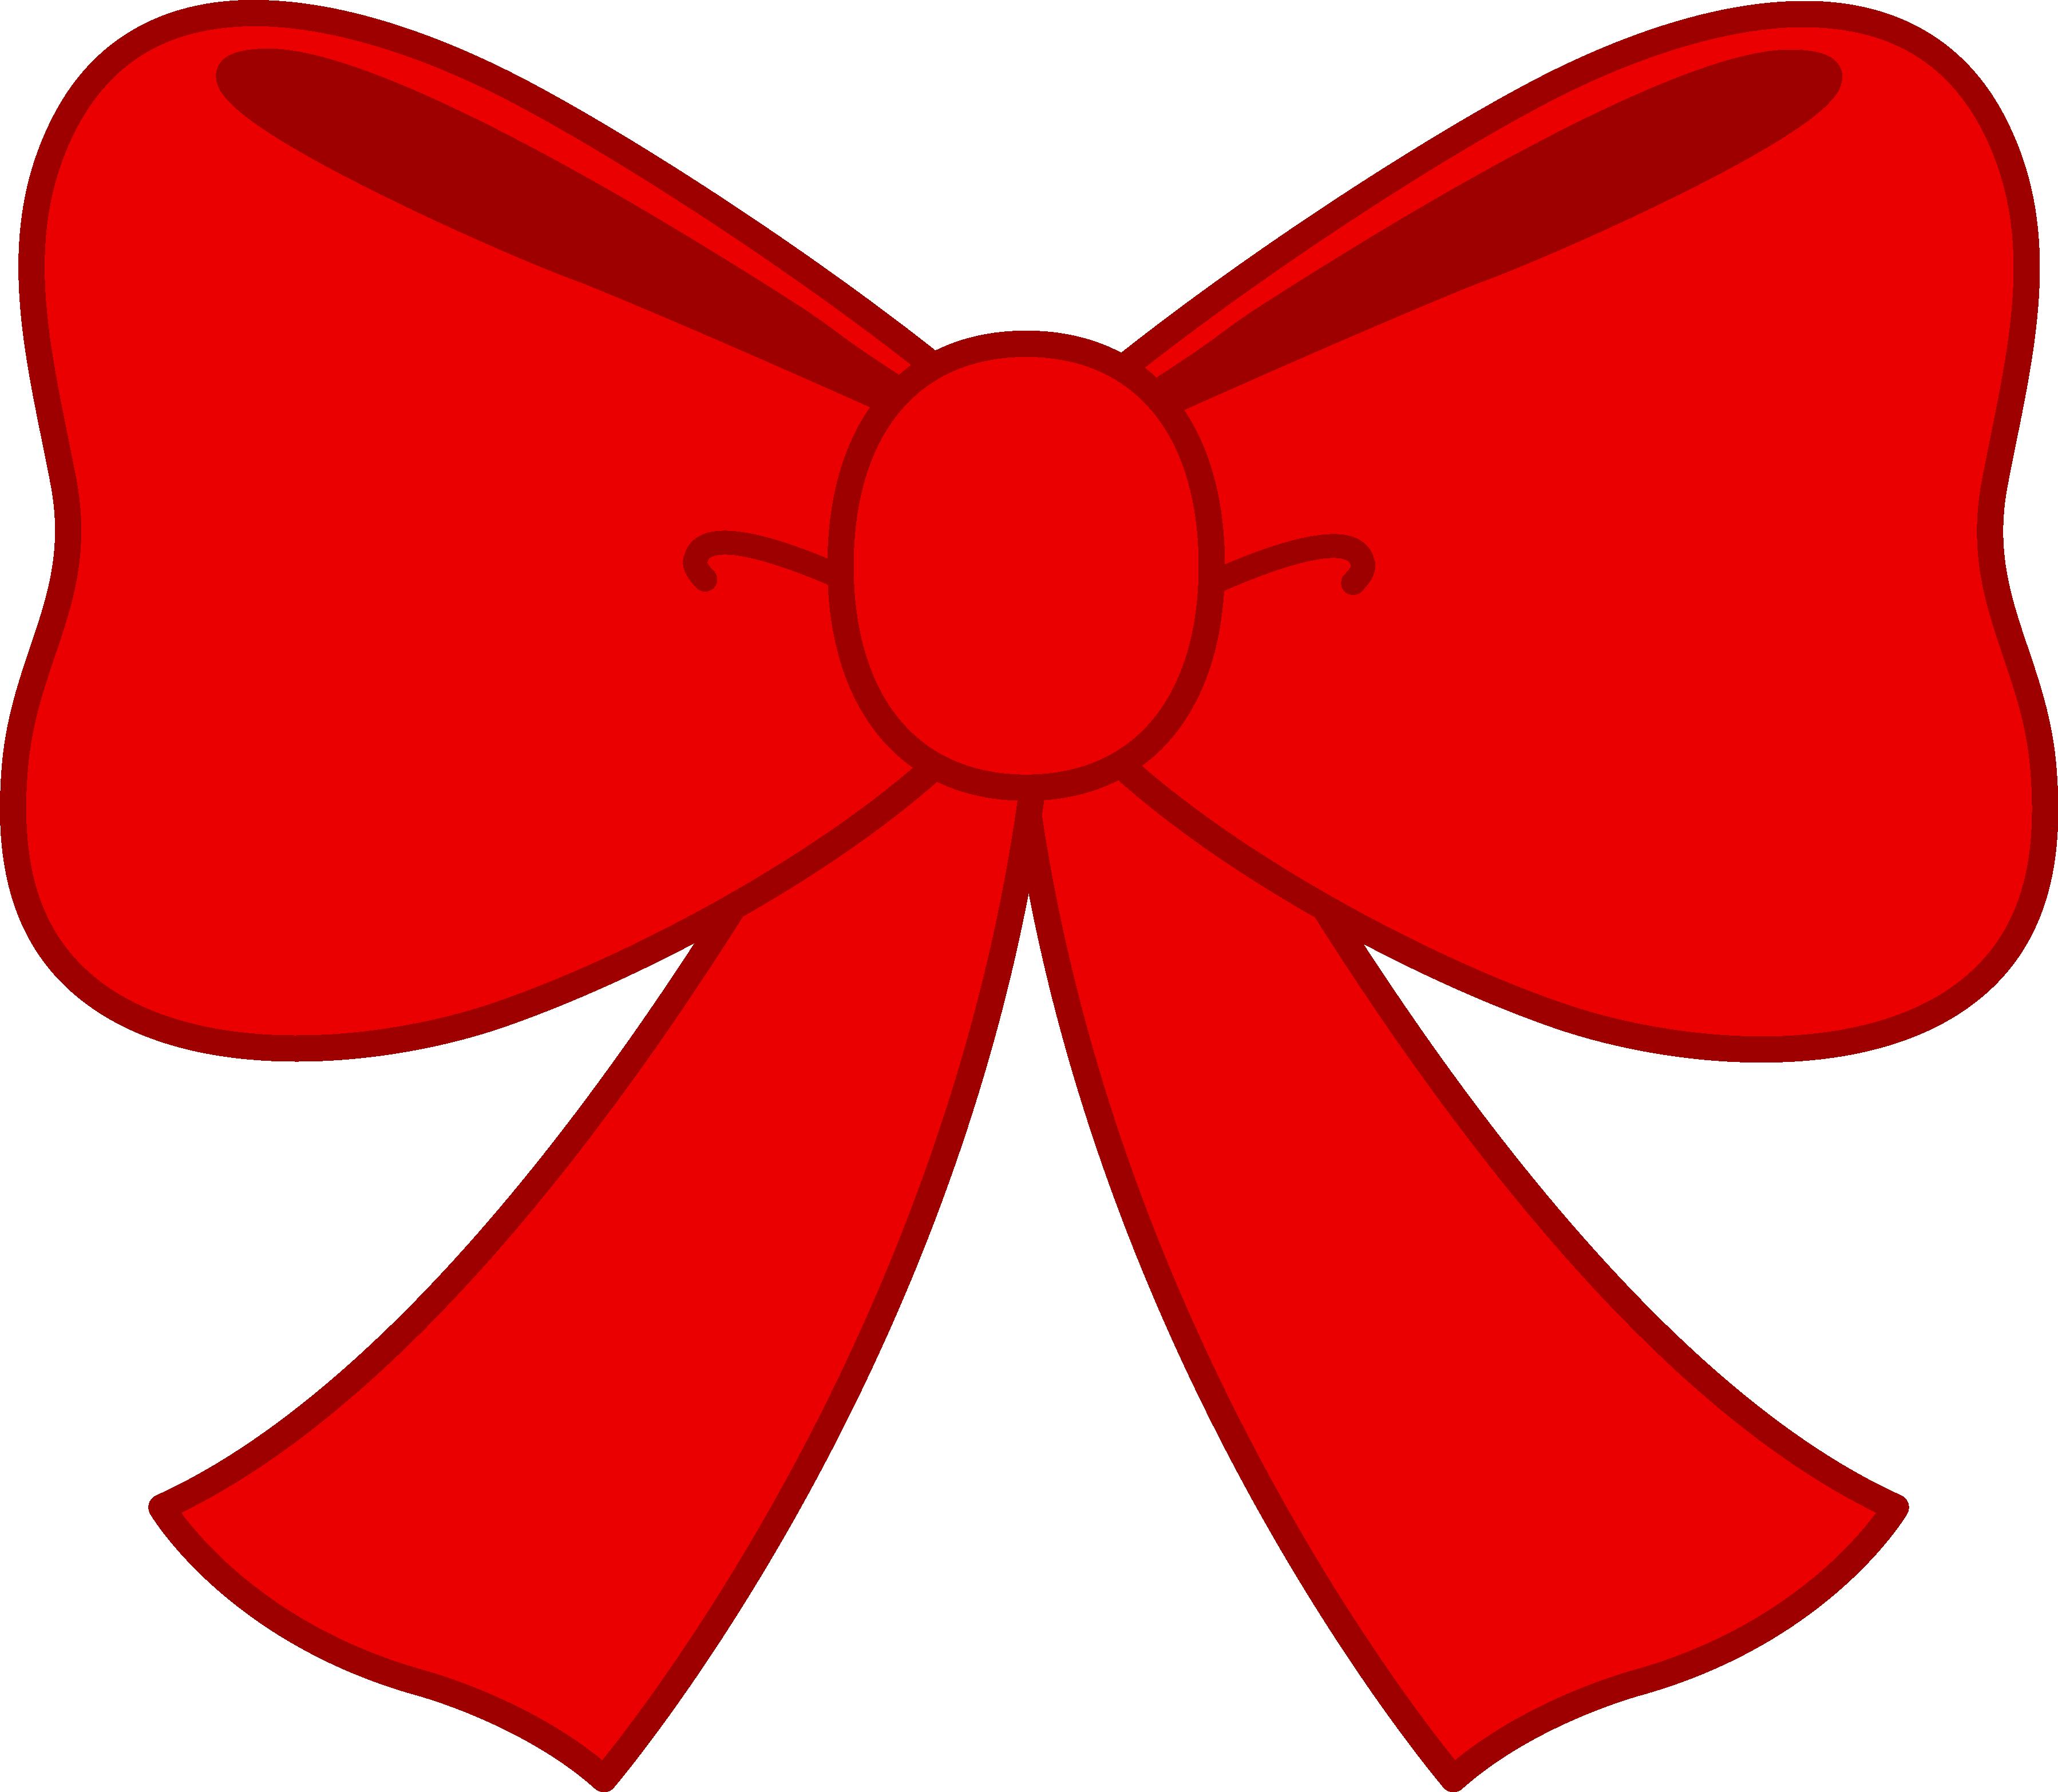 3596x3132 Hair Bow Clip Art